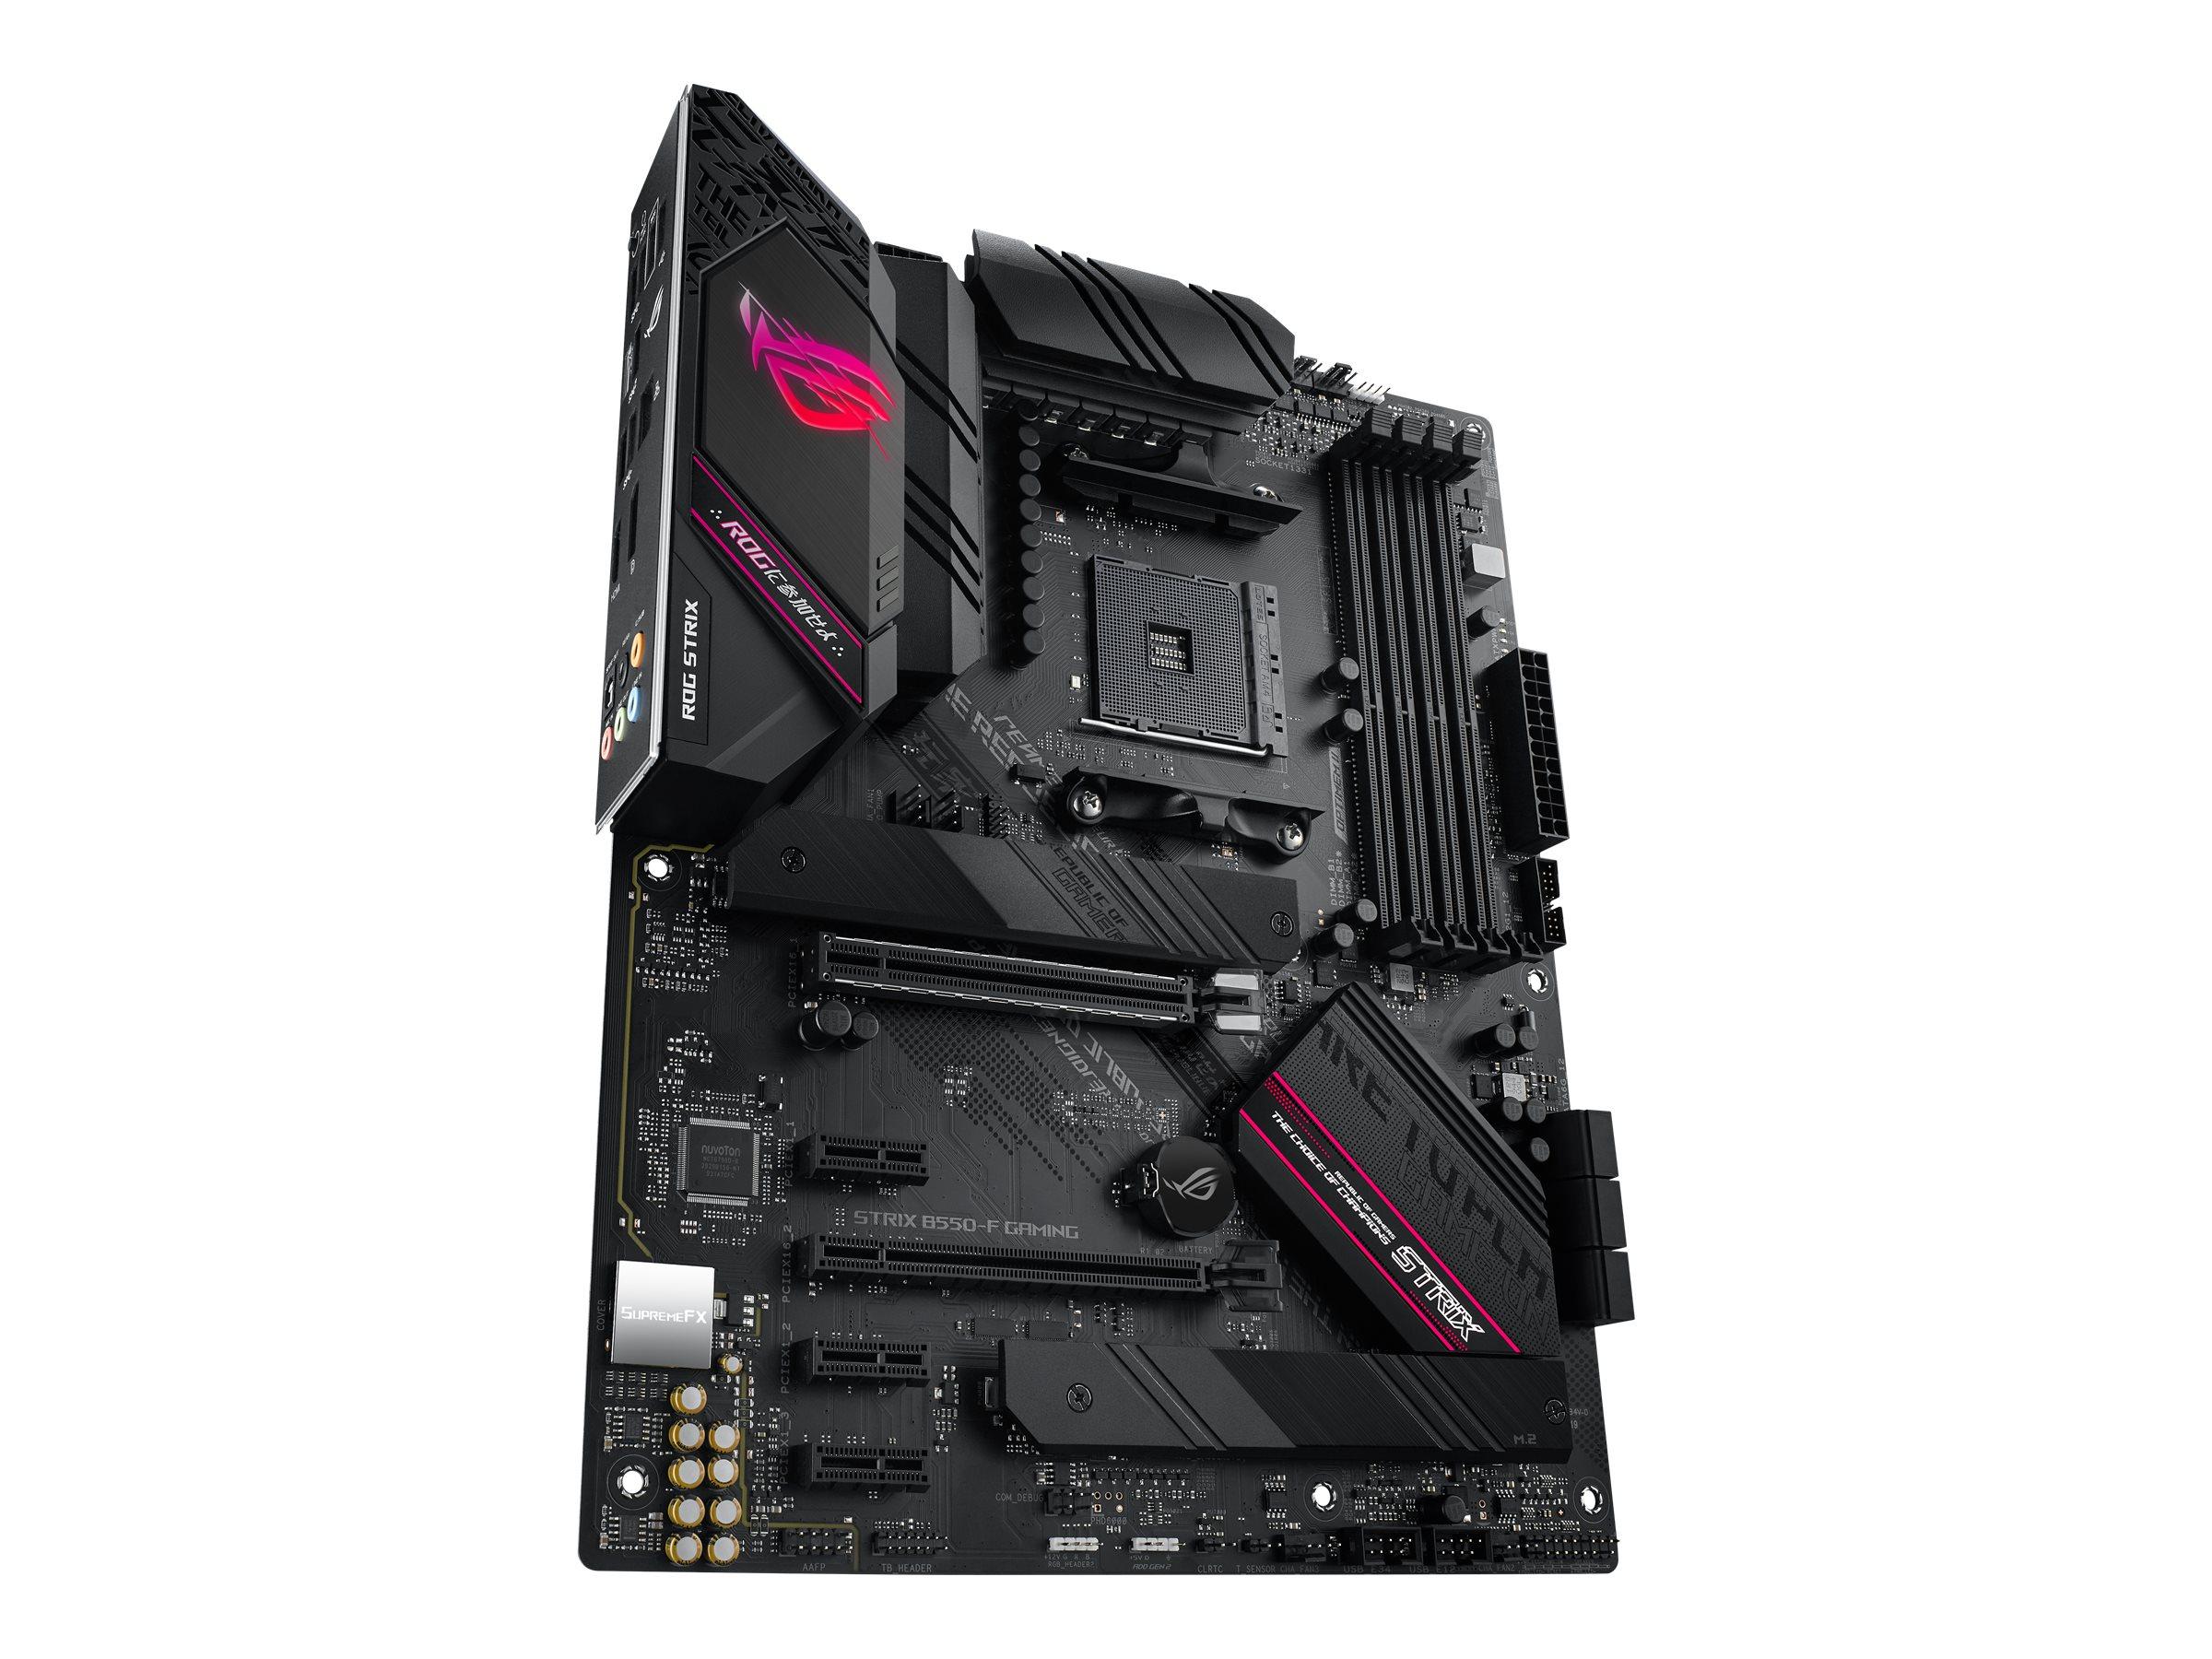 ASUS ROG STRIX B550-F GAMING - motherboard - ATX - Socket AM4 - AMD B550